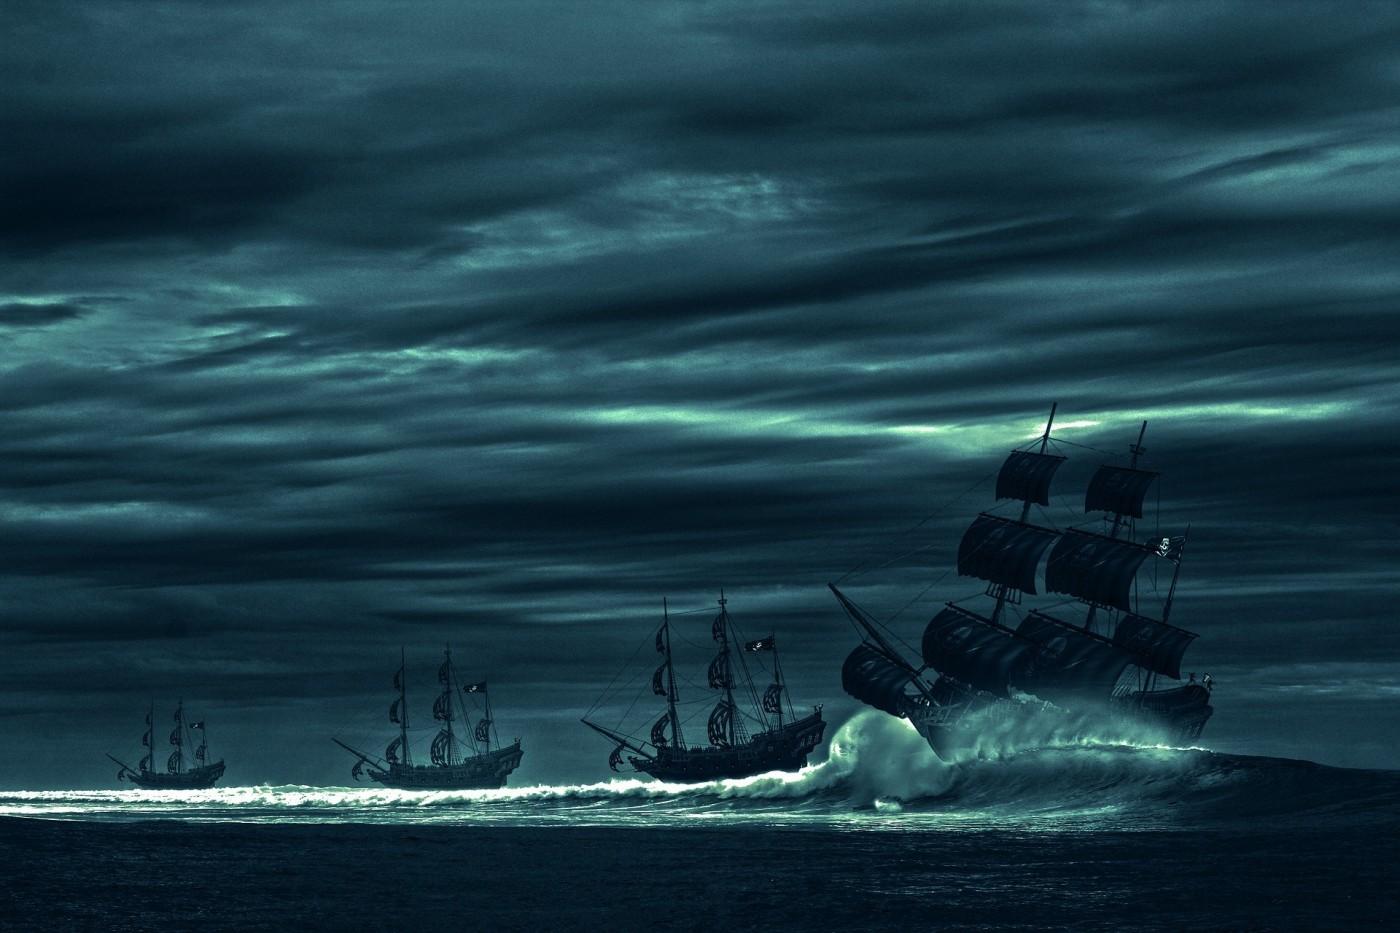 Disney+原創劇被盜得最慘!惡名昭彰「海盜灣」盜版功能再升級,還新增串流模式